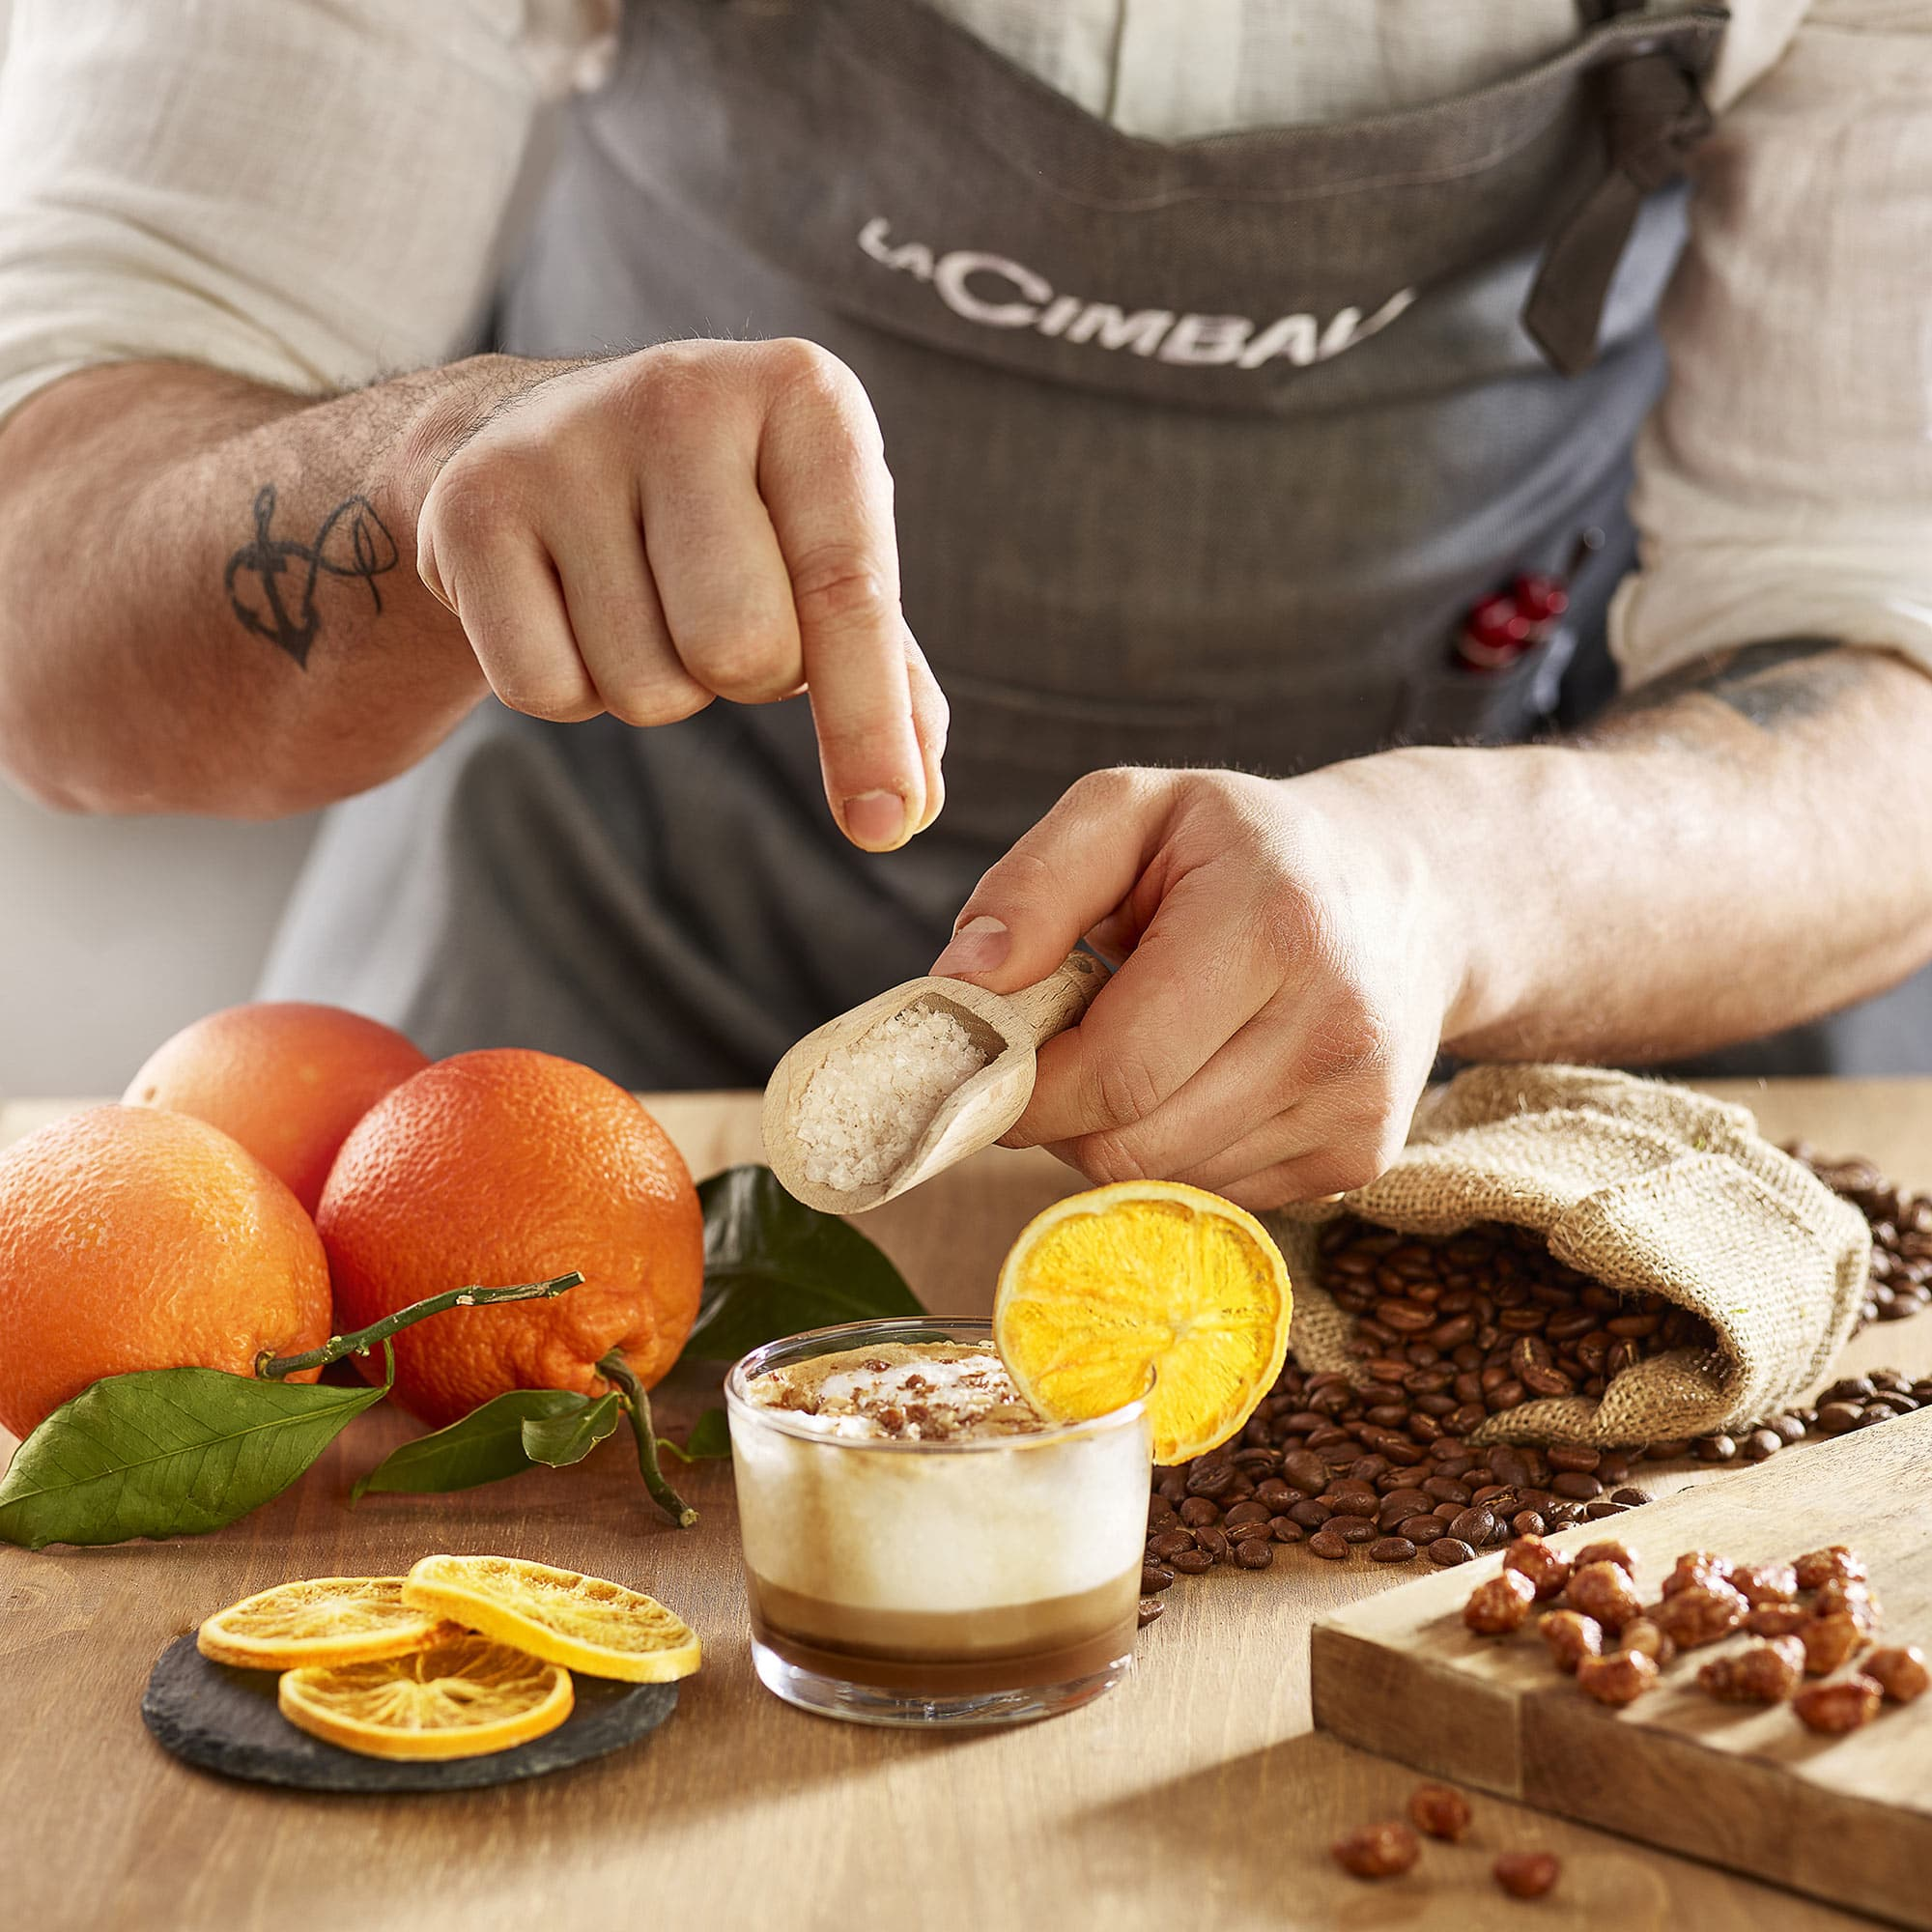 Cimbali Bicchiere Arancia Chef Cuoco Food Shot by Fotografando